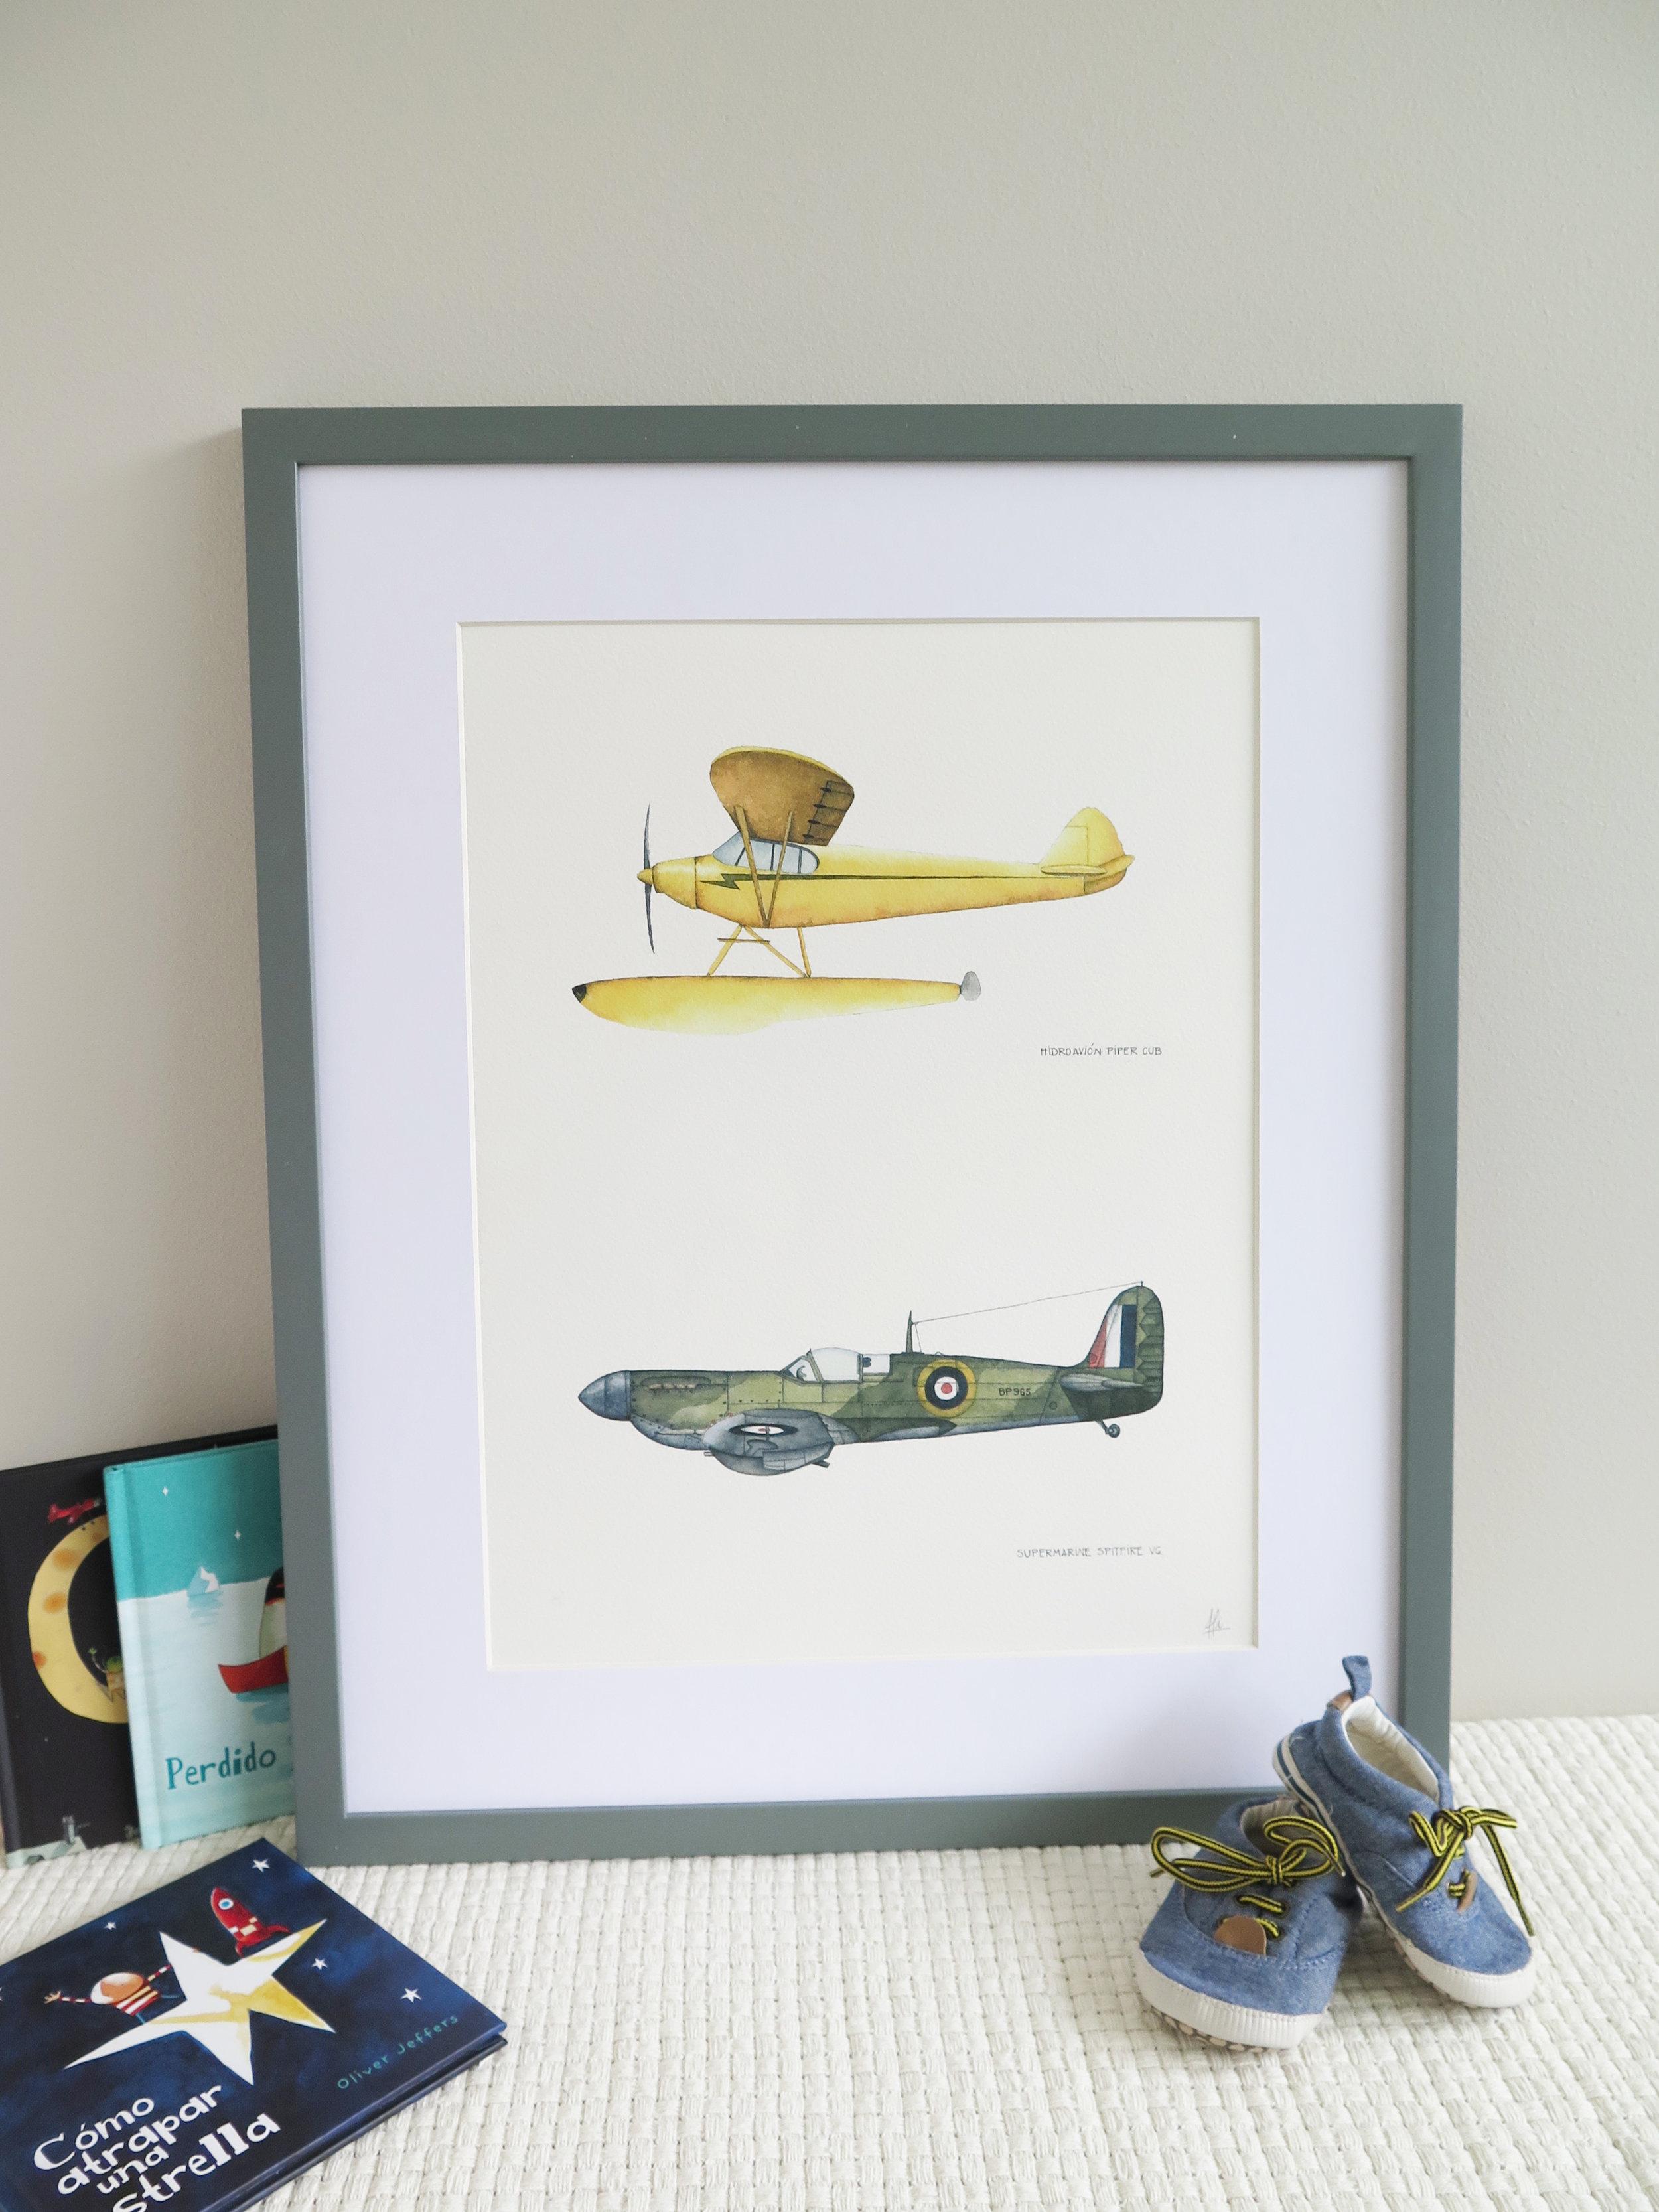 Cuadro doble: Hidroavión Piper Cub y Supermarine Spitfire Valor: $72.000 Tamaño Lámina: 31 x 41 cms. Tamaño Cuadro: 46 x 56 cms. Marco: Blanco, Gris o Albayalde